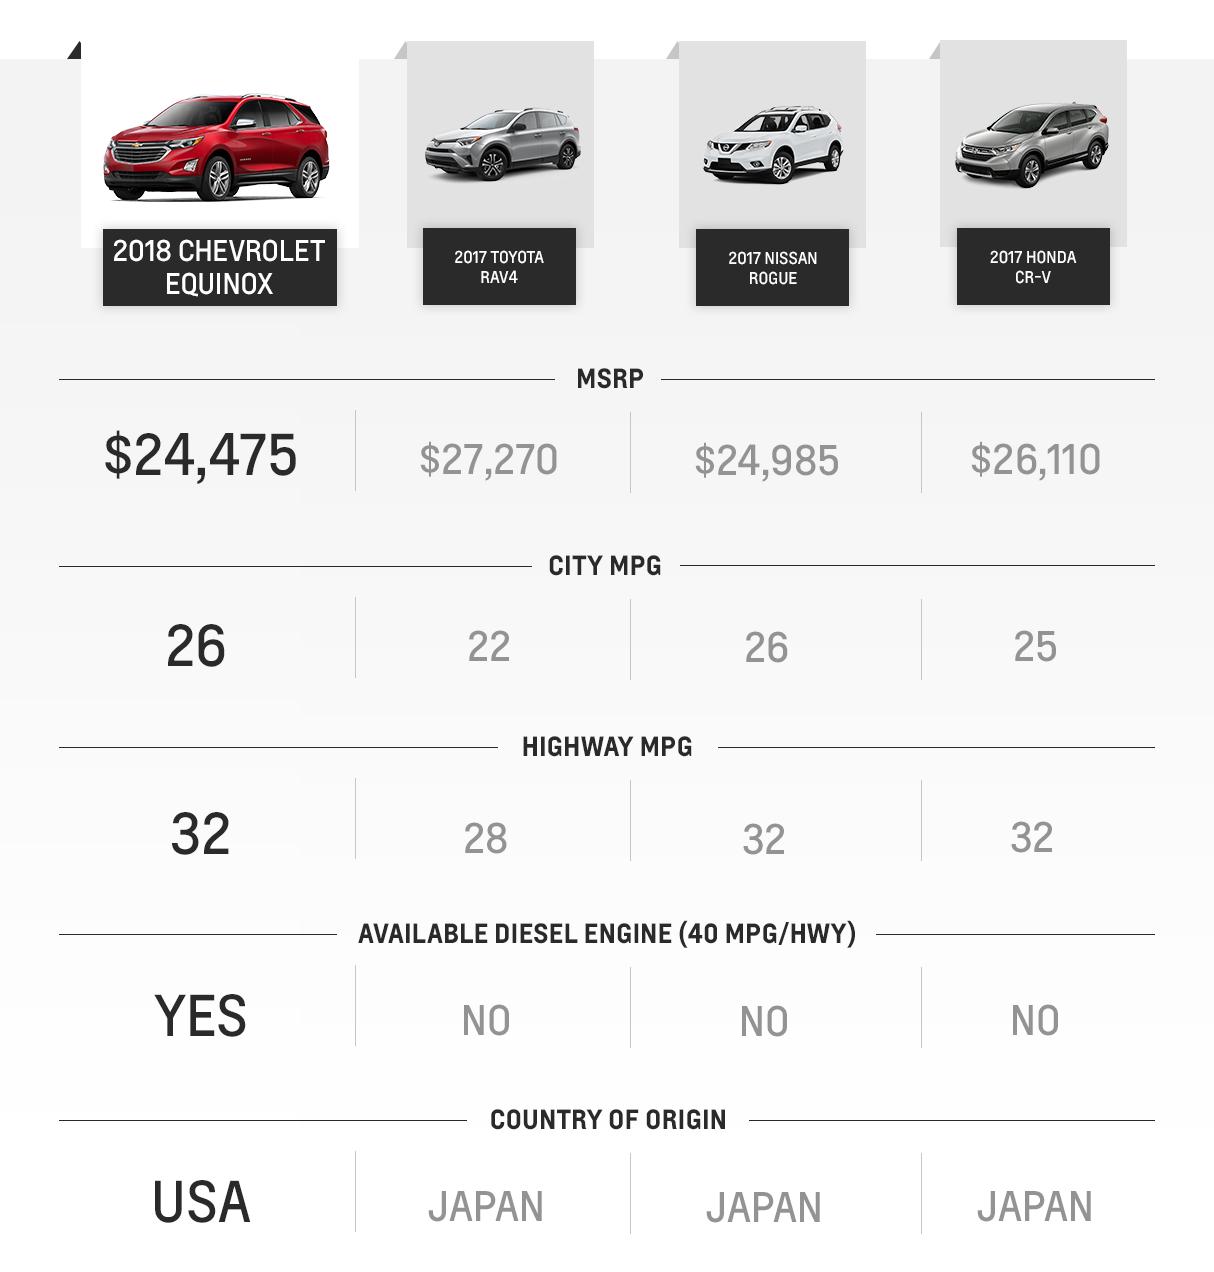 Chevrolet Lowell: 2018 Chevrolet Equinox Comparison